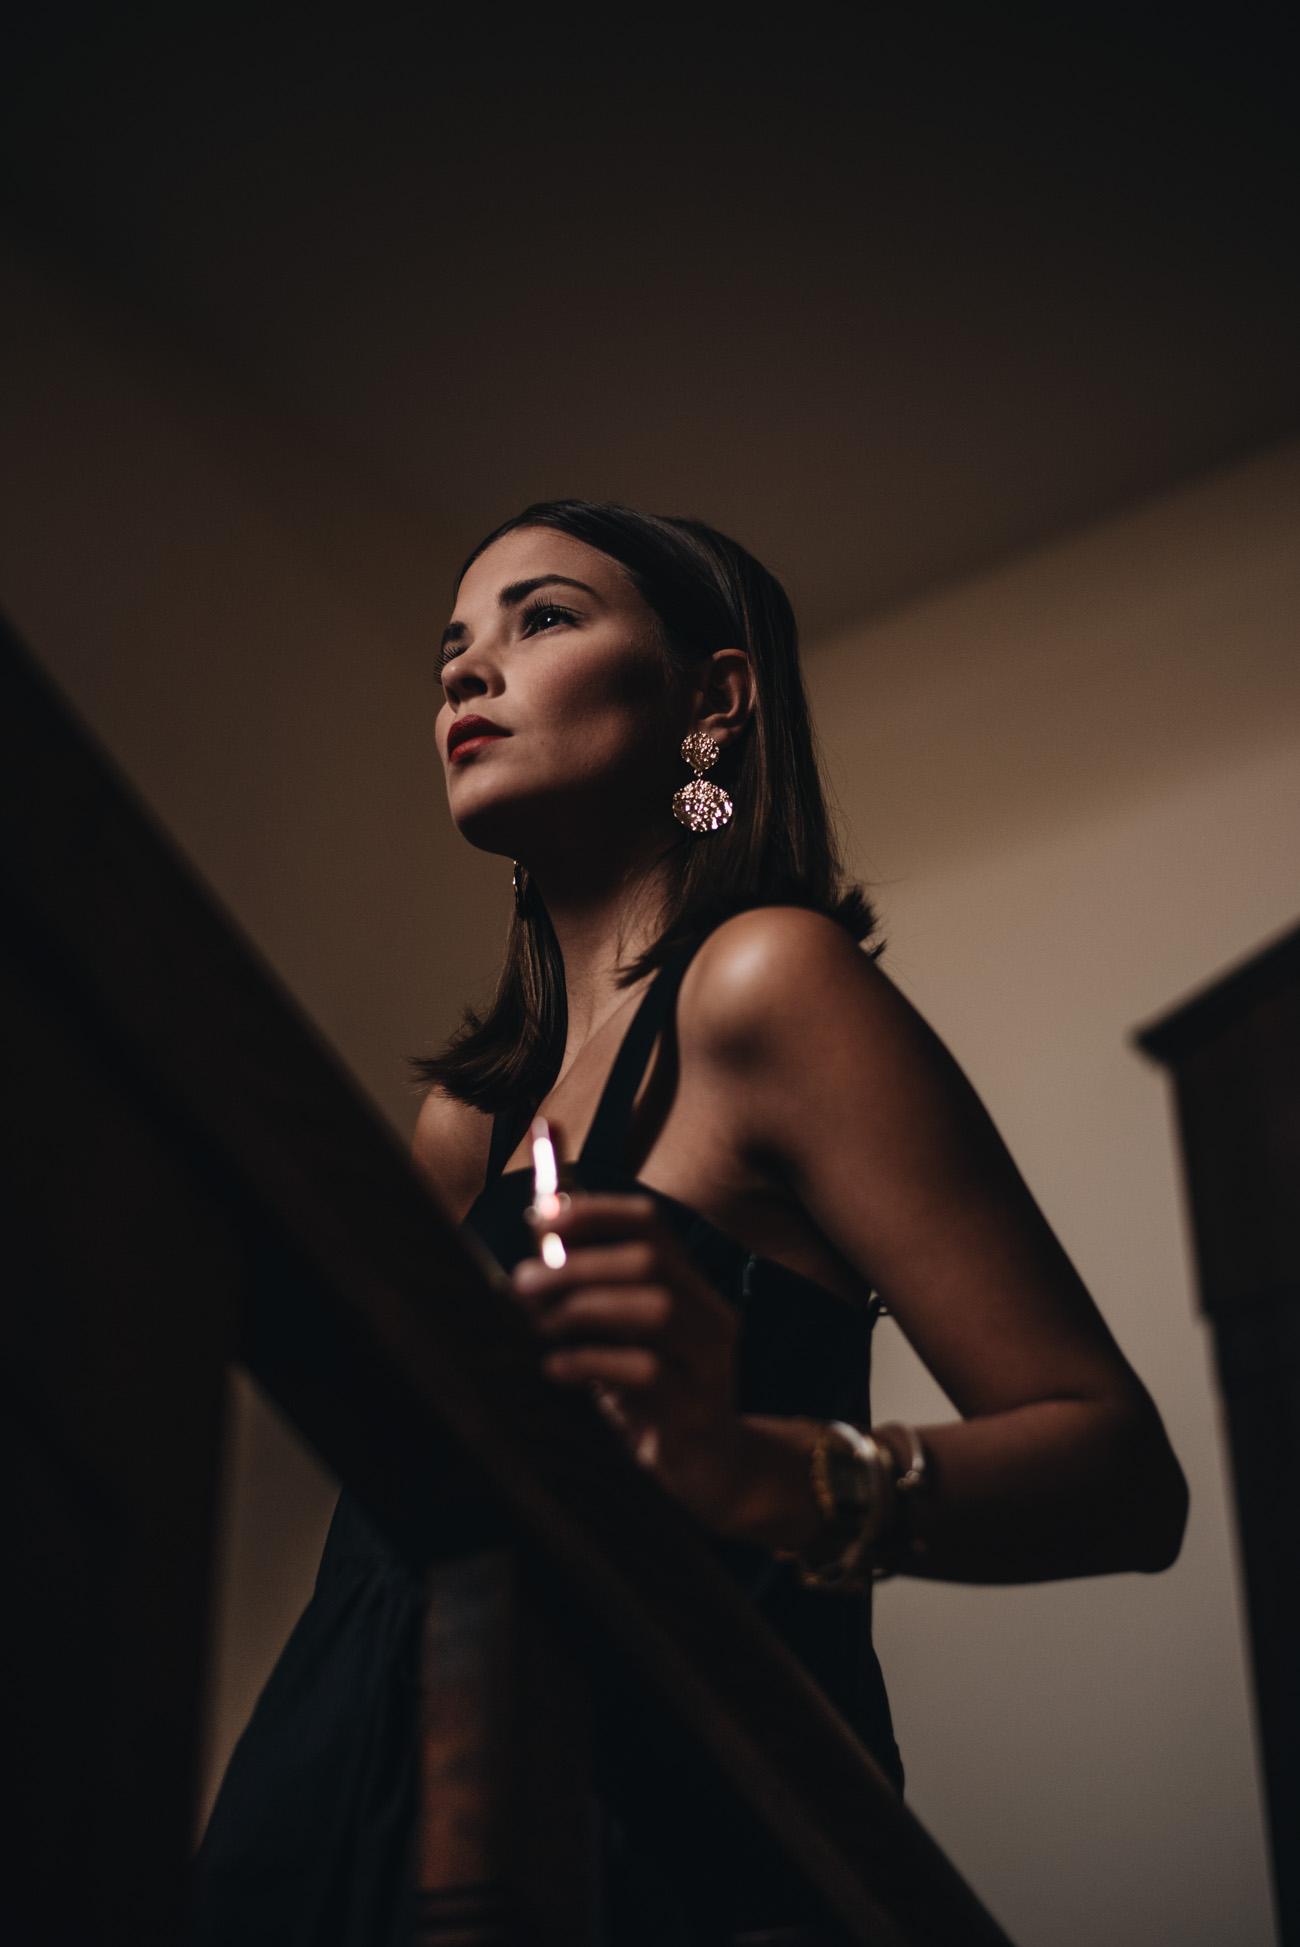 Beauty-editorial-shooting-Blogger-Fotoshooting-Make-Up-Trends-2018-fashiioncarpet-nina-schwichtenberg